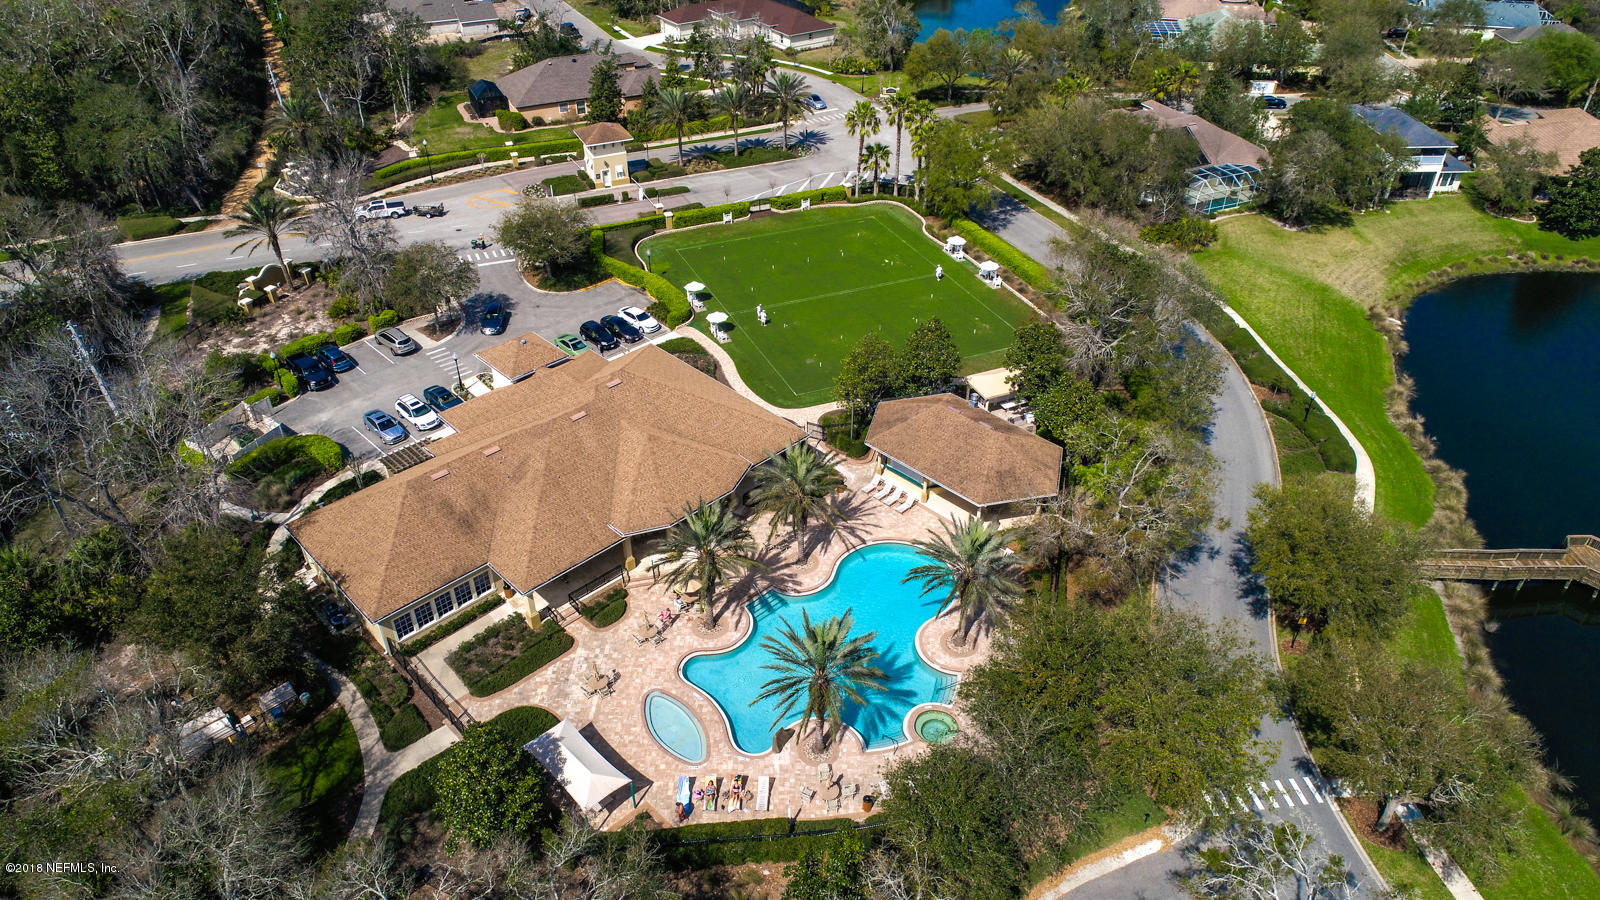 59 WATERFRONT PARK, PALM COAST, FLORIDA 32137, ,Vacant land,For sale,WATERFRONT PARK,927185